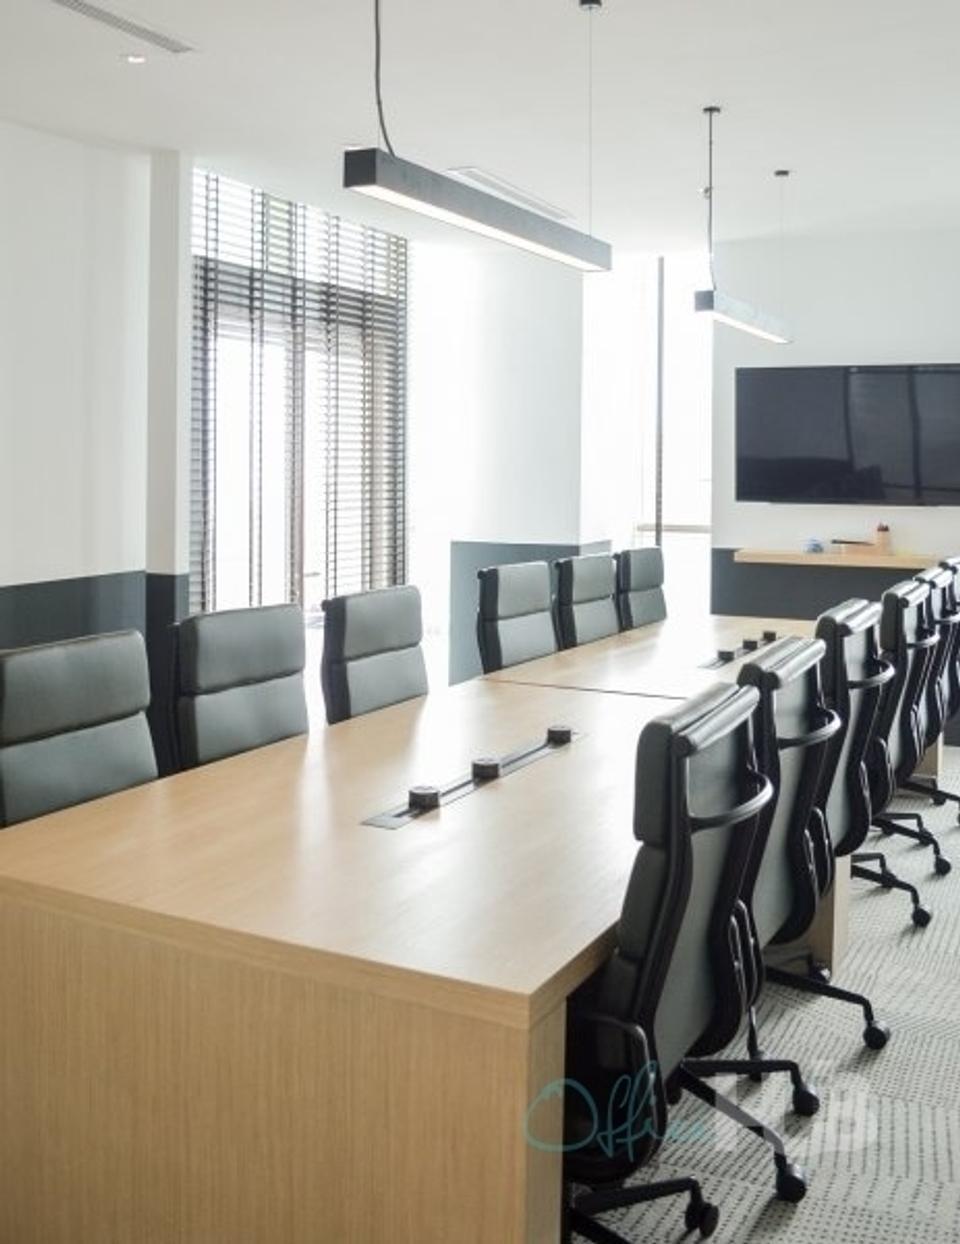 4 Person Private Office For Lease At Jalan Bukit Bintang, Kuala Lumpur, Kuala Lumpur, 55100 - image 1